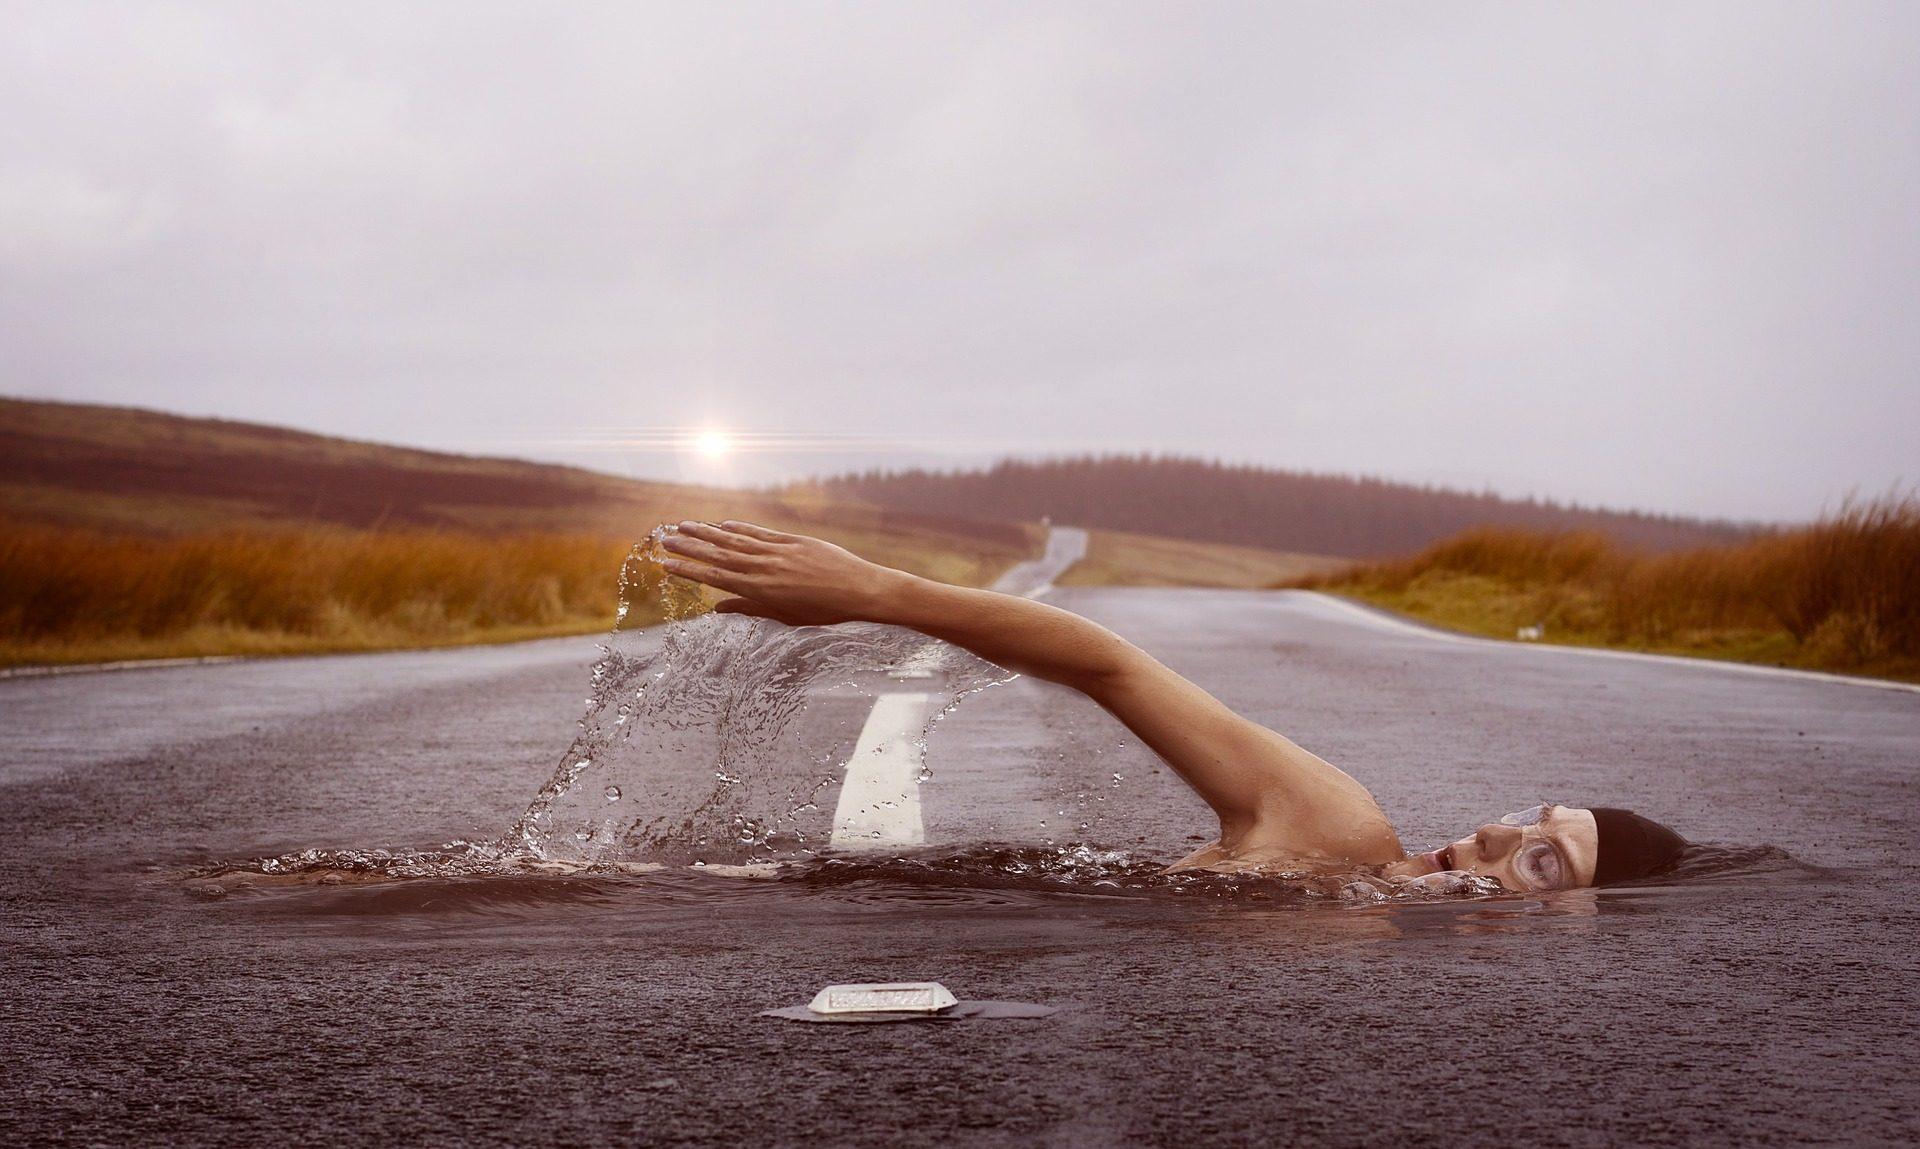 carretera, सड़क, तैराक, पानी, प्रयास - HD वॉलपेपर - प्रोफेसर-falken.com